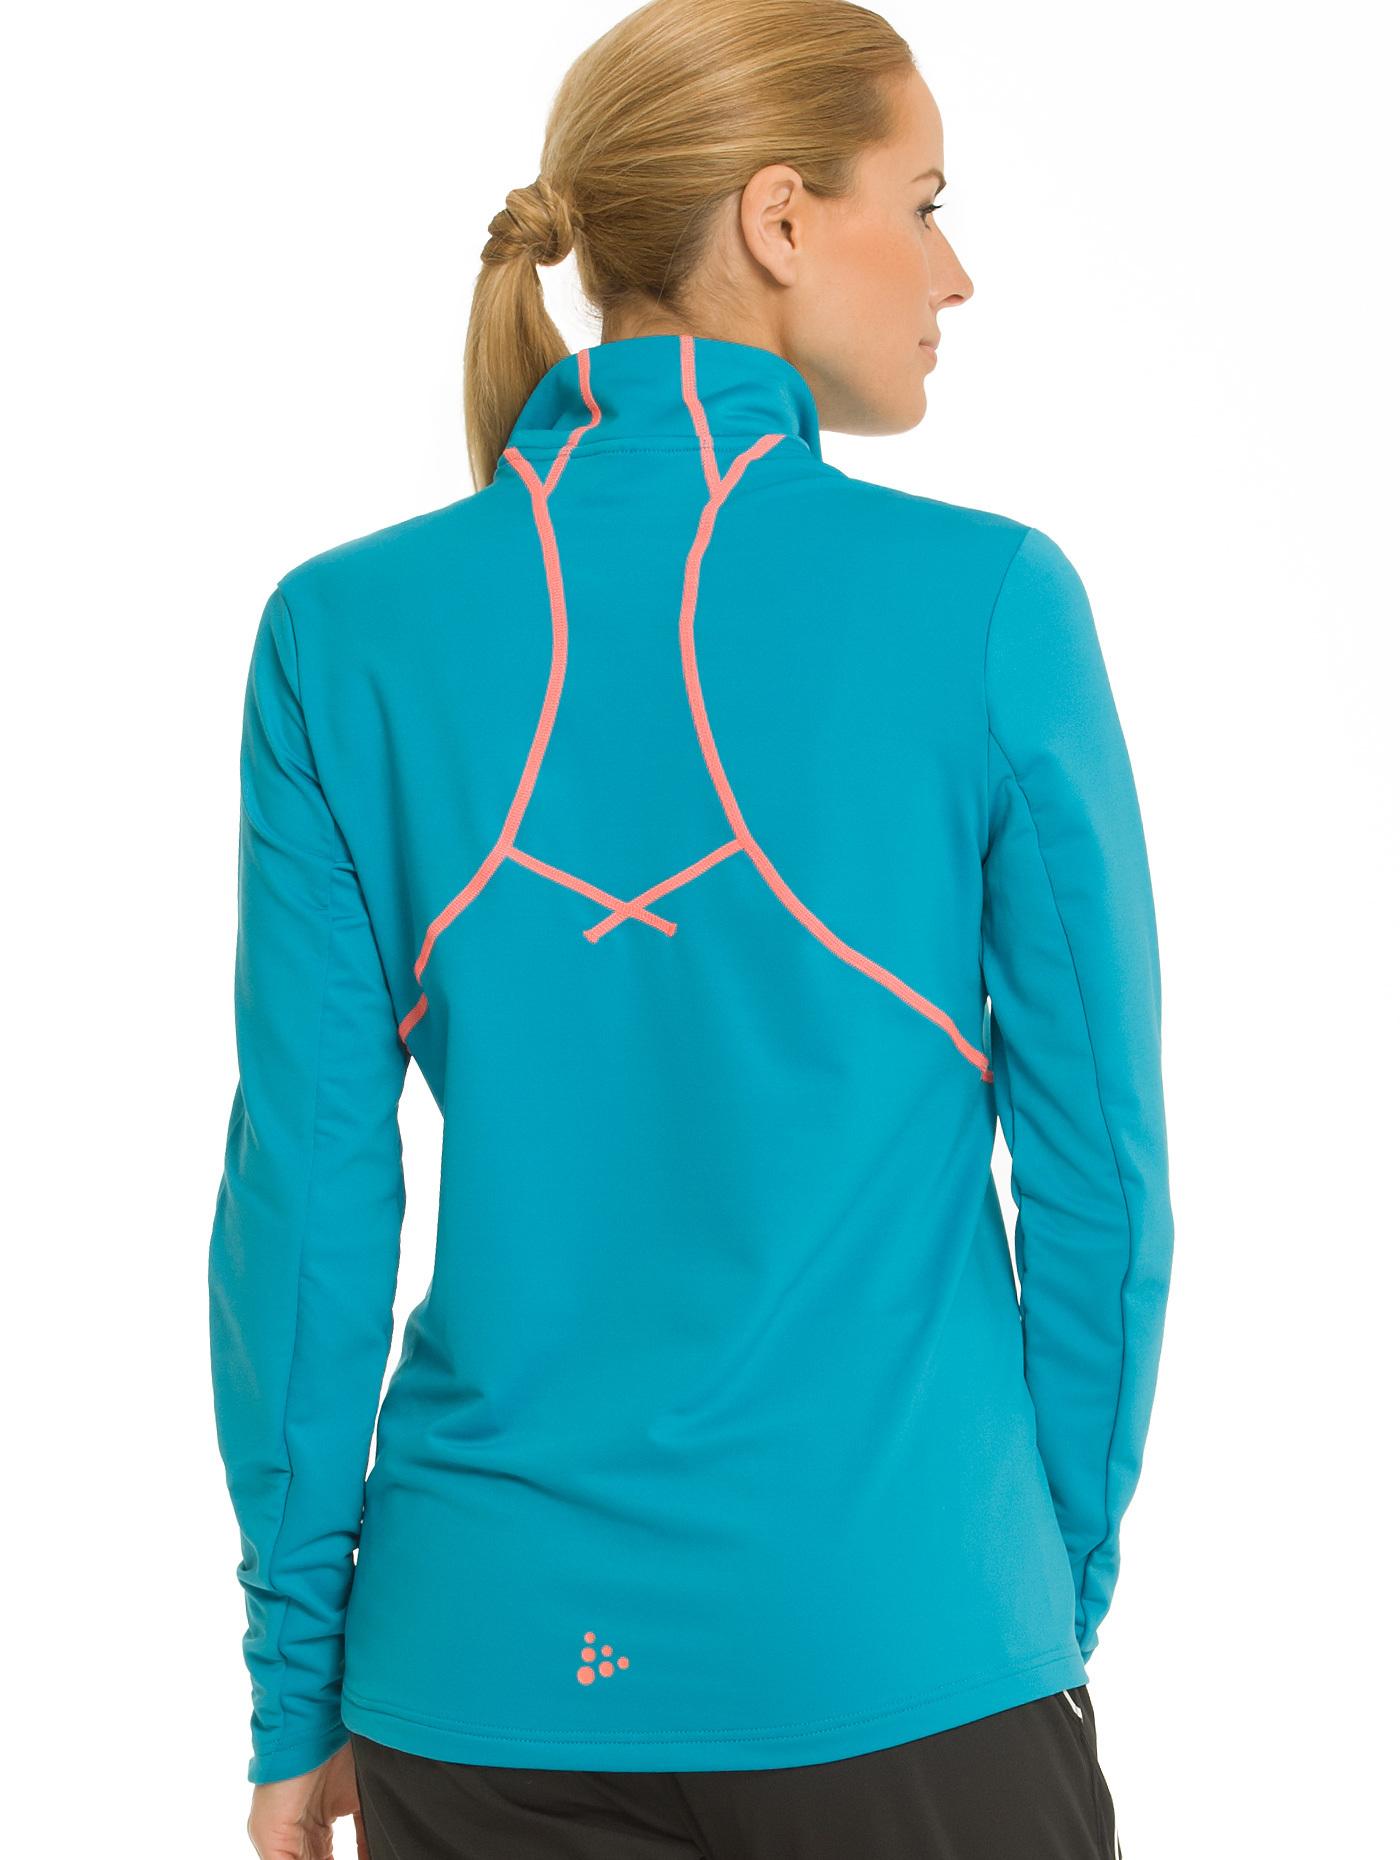 1902875-2318 Толстовка пуловер Craft Lightweight женская blue